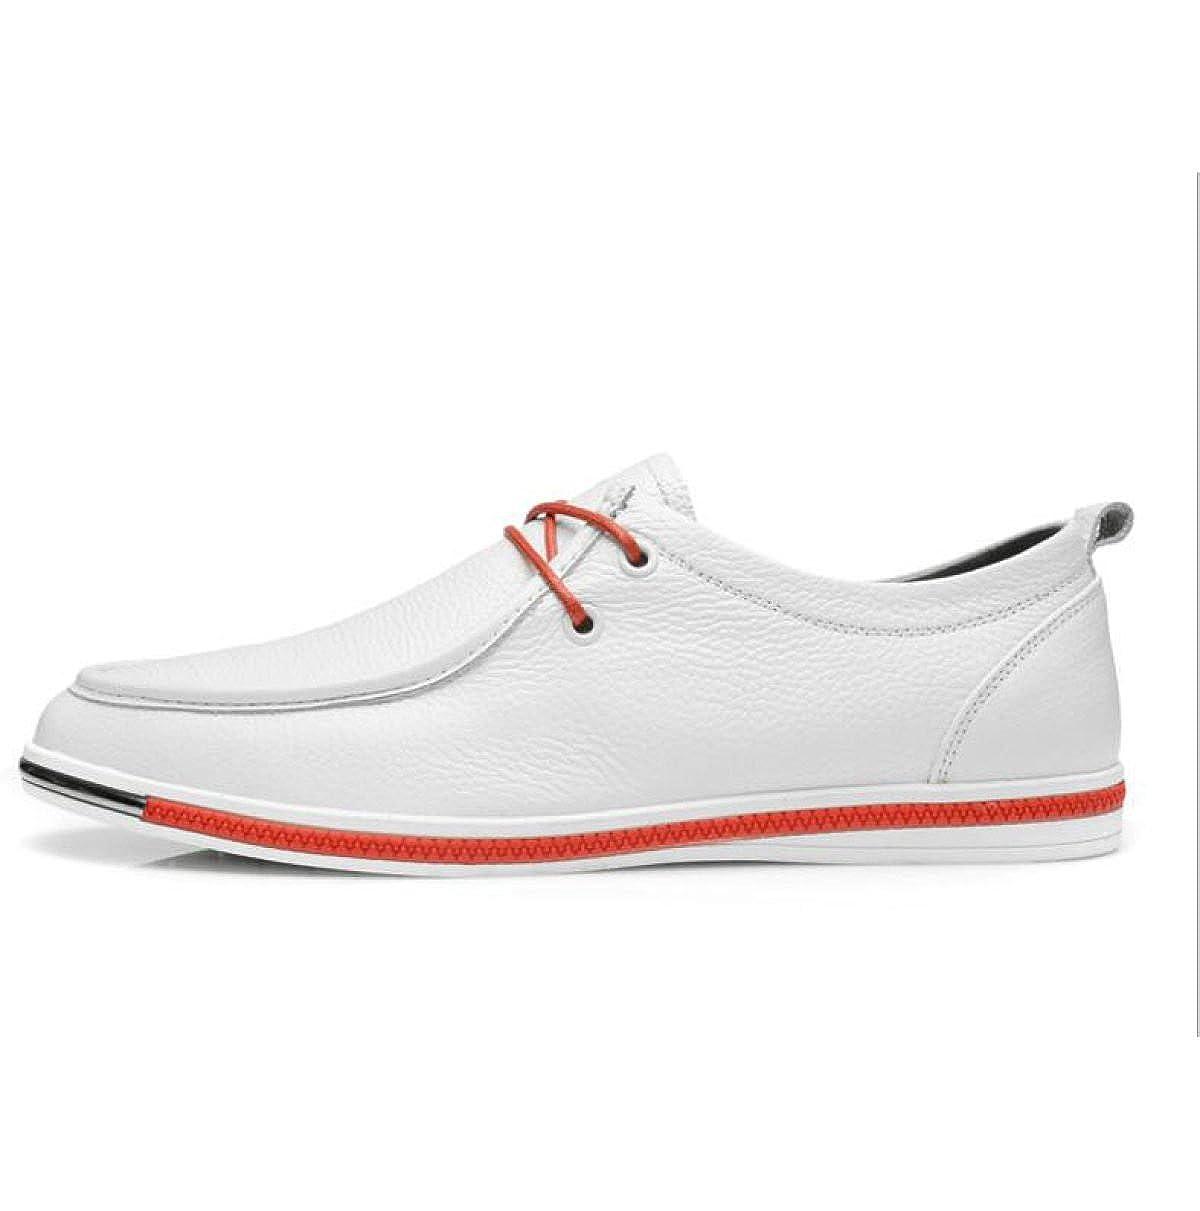 da6df24da6ca4 GTYMFH Zapatos De Cuero Hechos A Mano De Cuero De De De Encaje  C oacute modos Hombres Casual De Negocios Transpirables Zapatos De Hombre  21bc0e